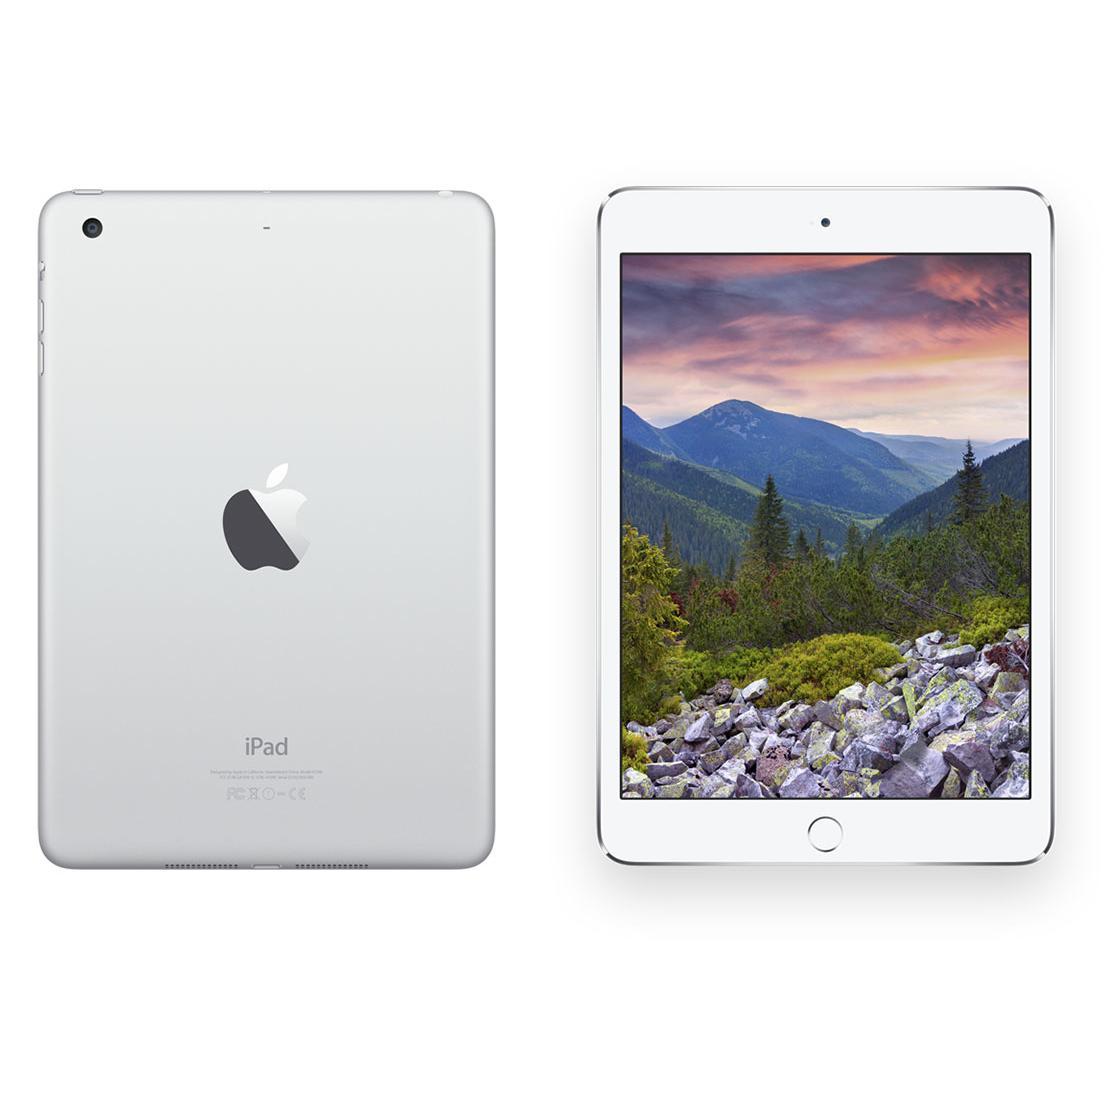 iPad mini 3 16 Go - Wifi - Argent